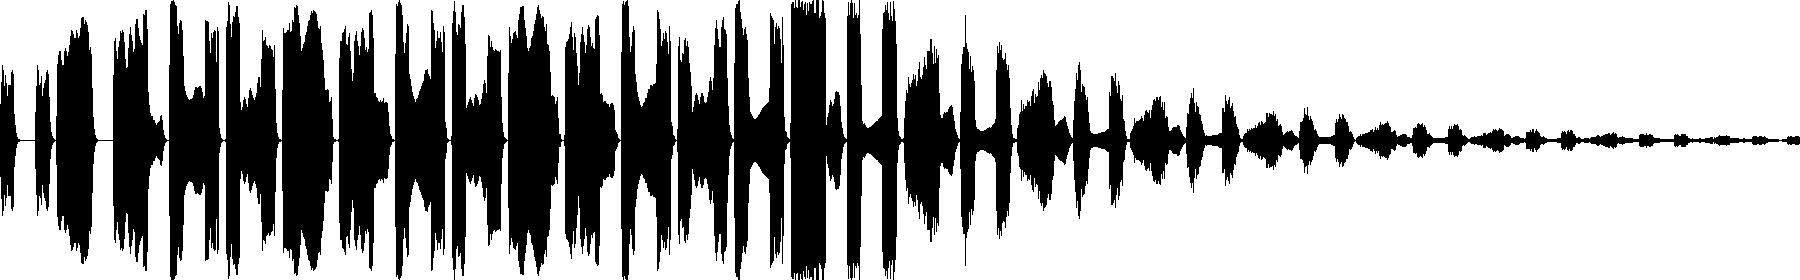 shg fx loop 02